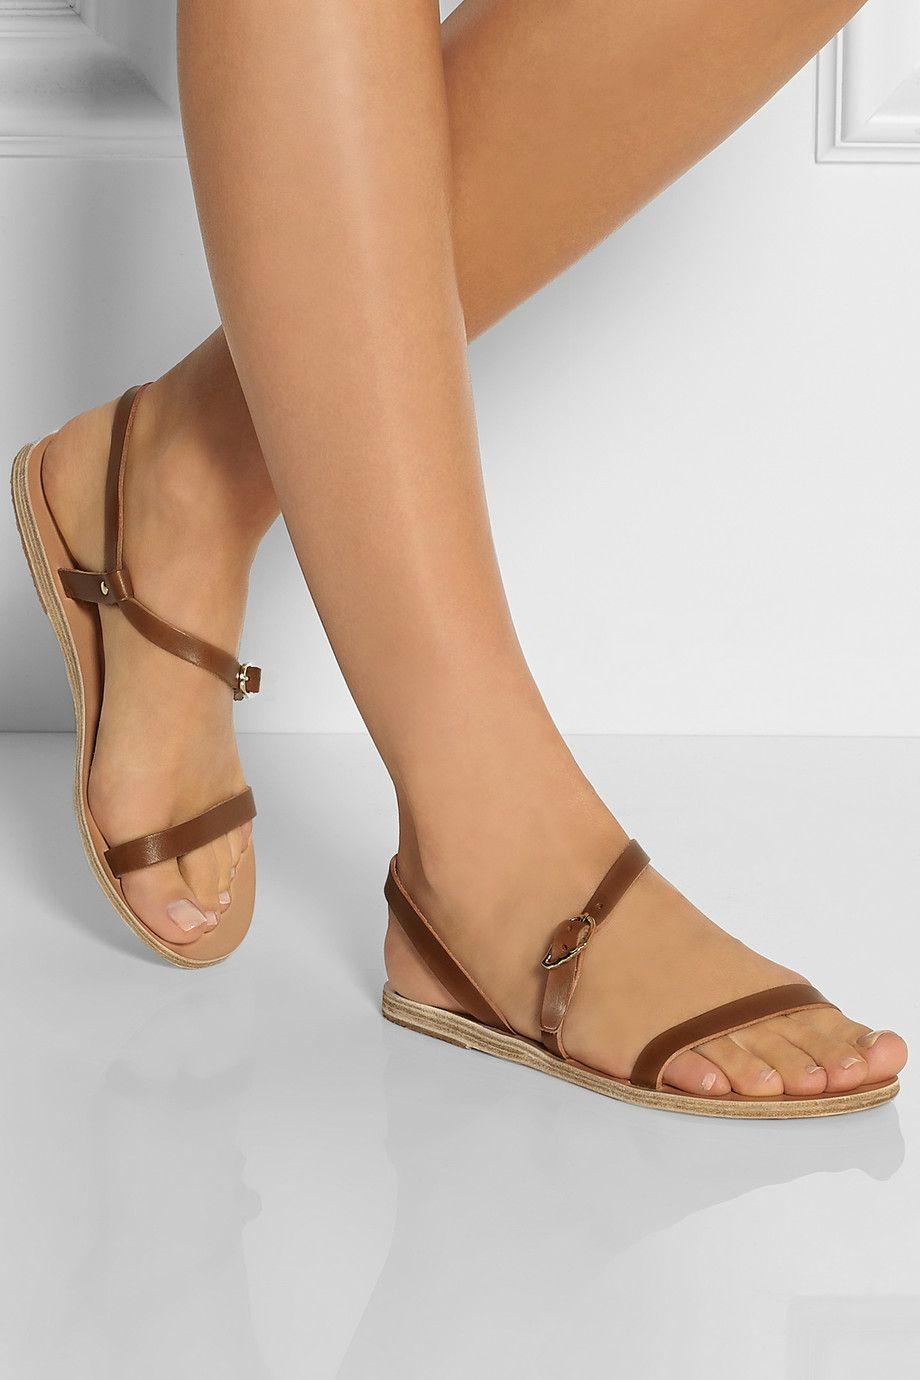 Ancient Greek Sandals - Niove leather sandals